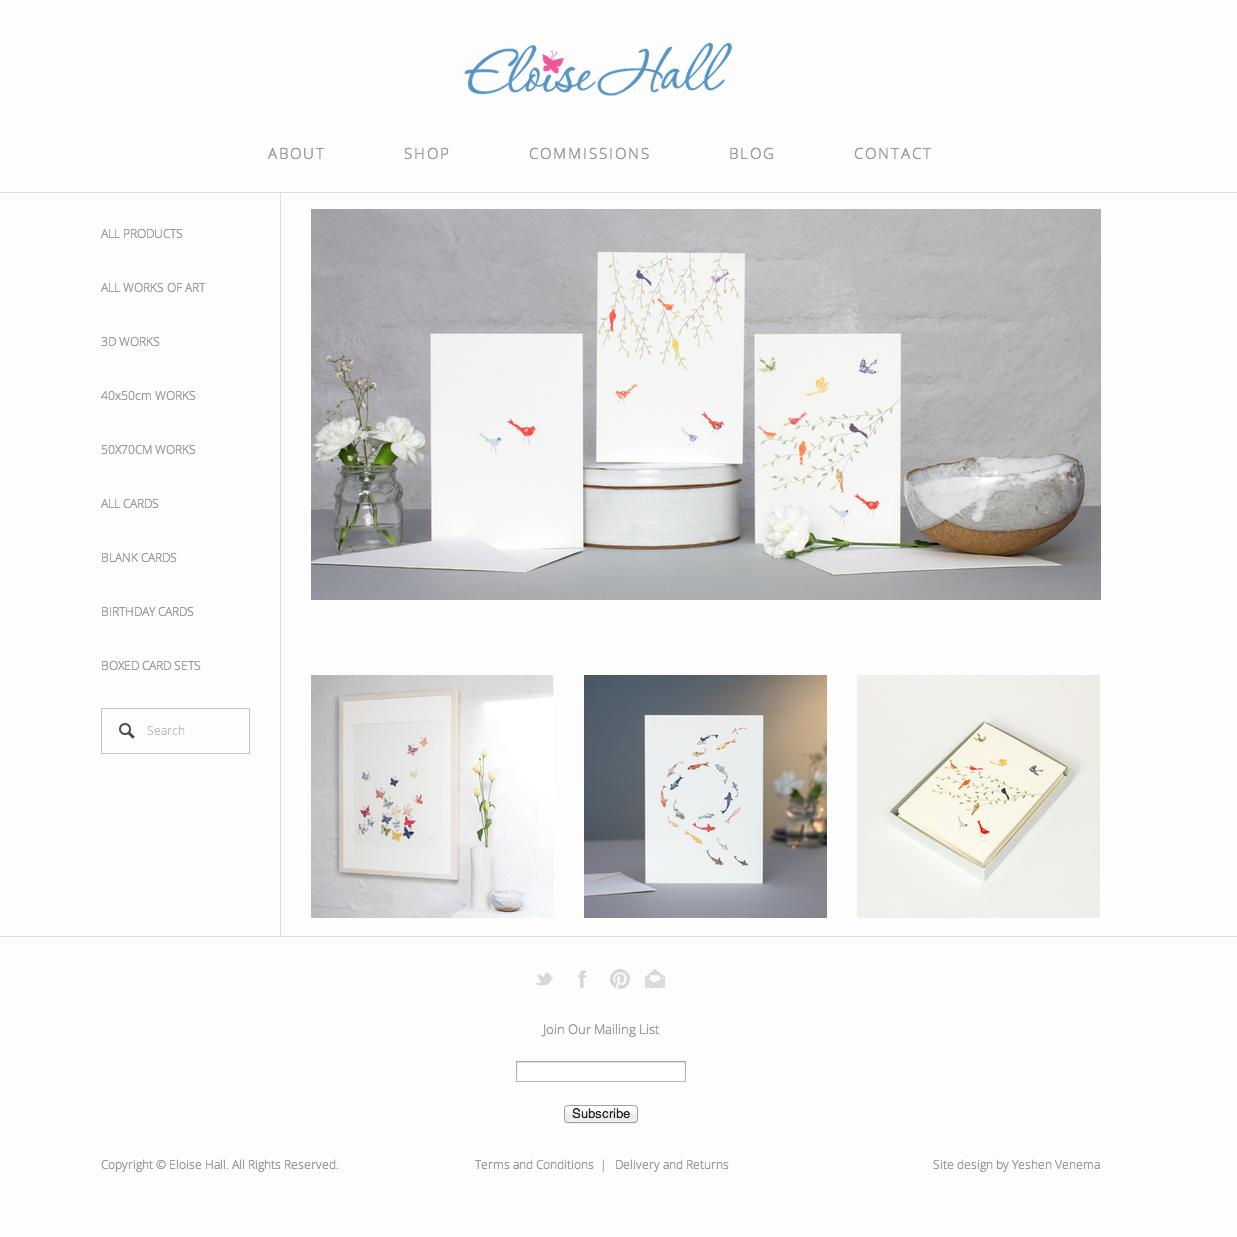 Eloise-Hall-Homepage-Yesh-and-Tash.png